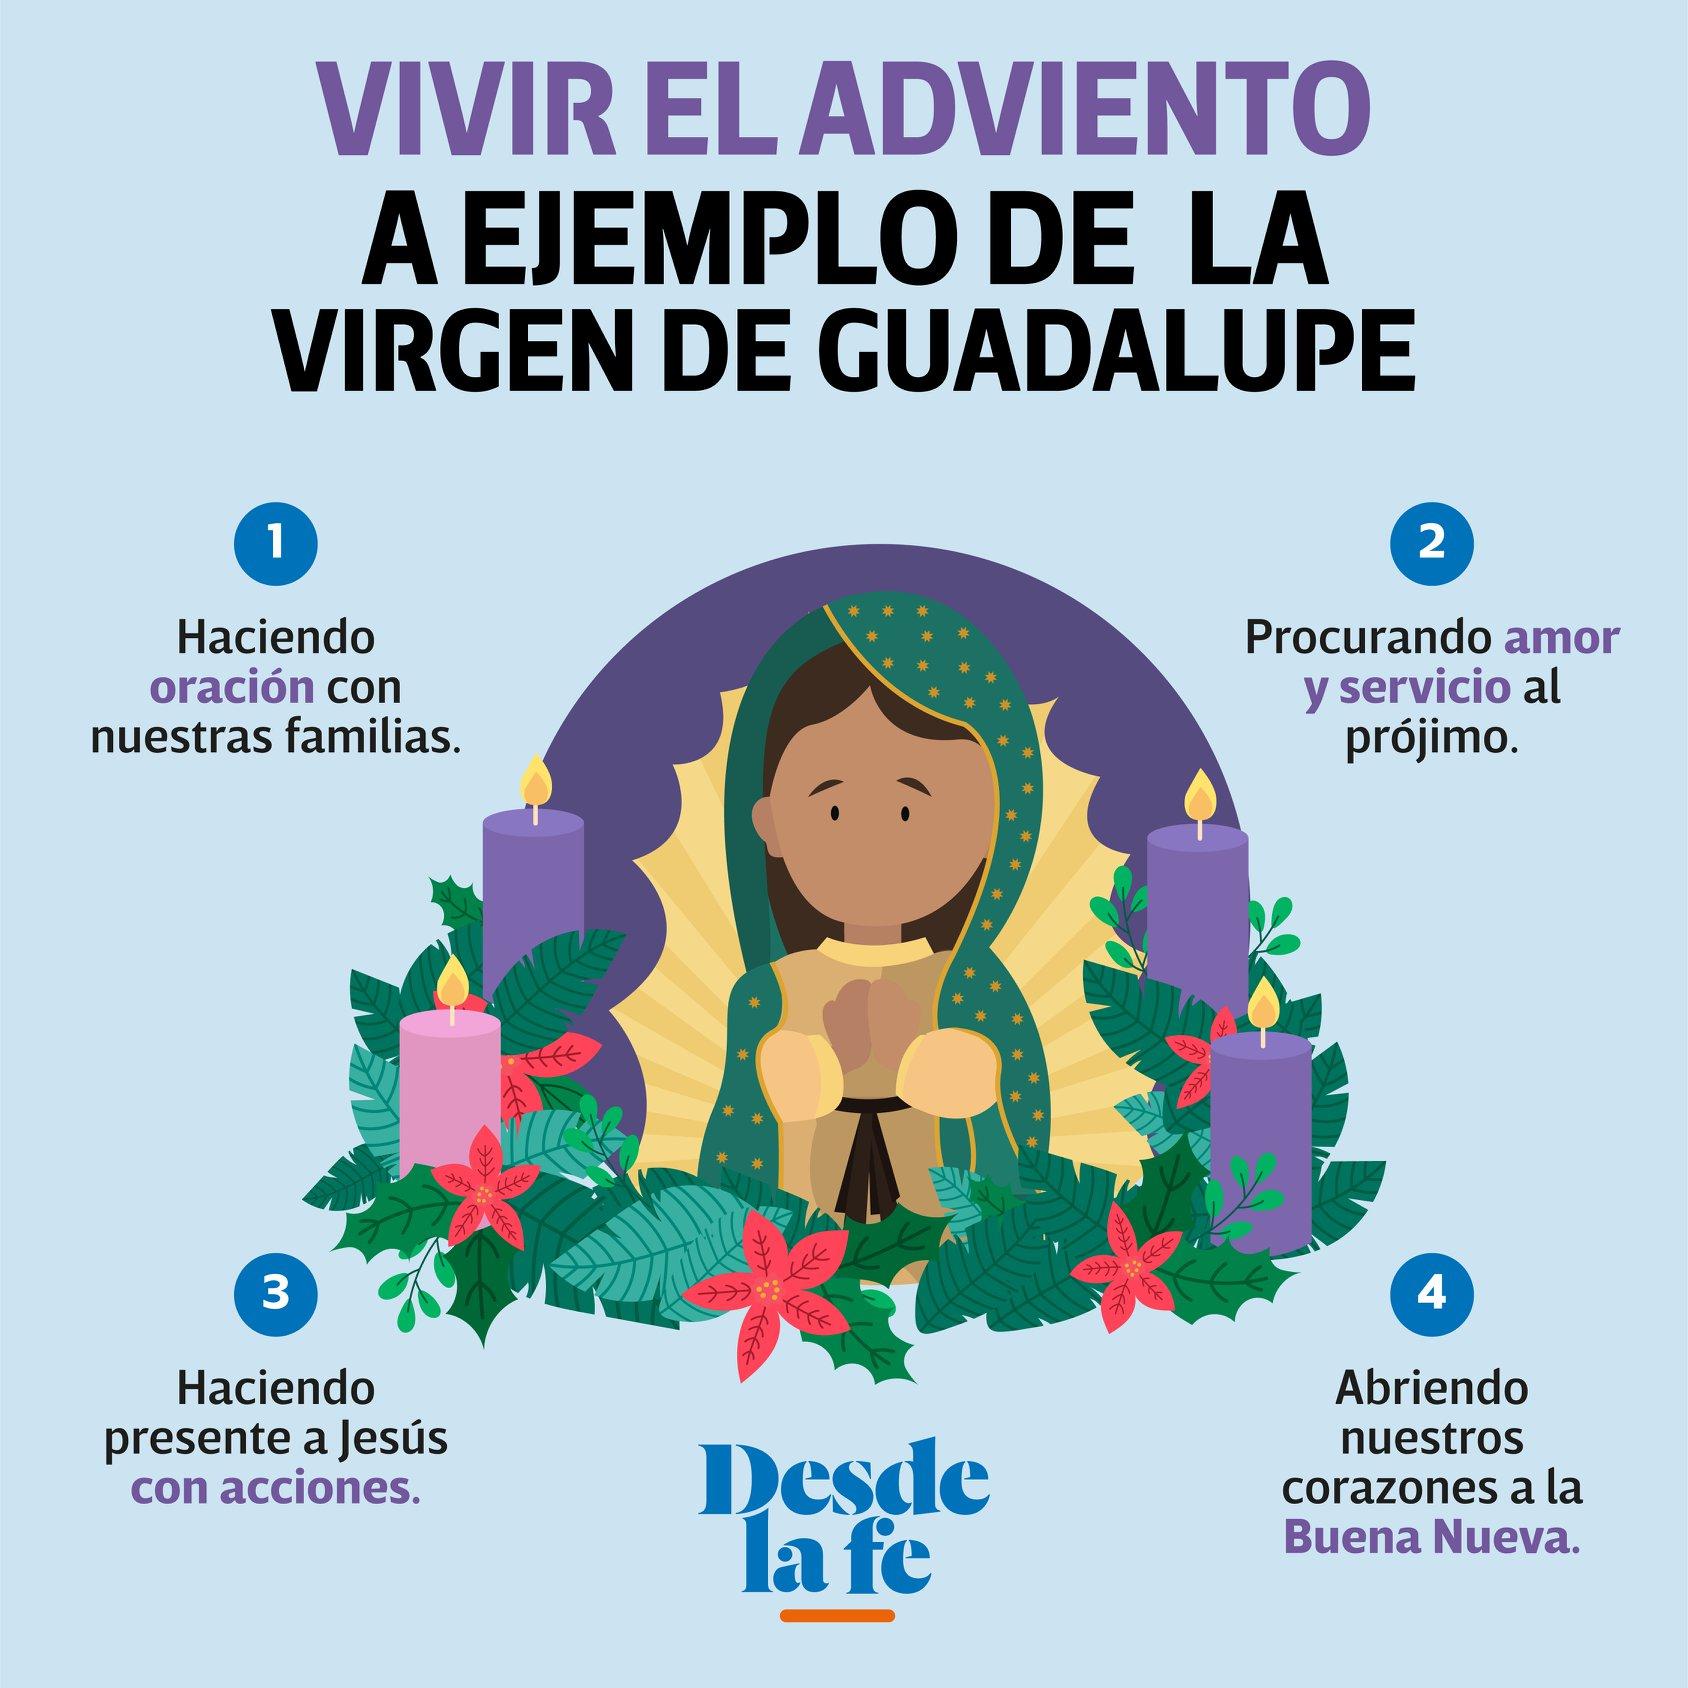 Adviento a ejemplo de la Virgen de Guadalupe.